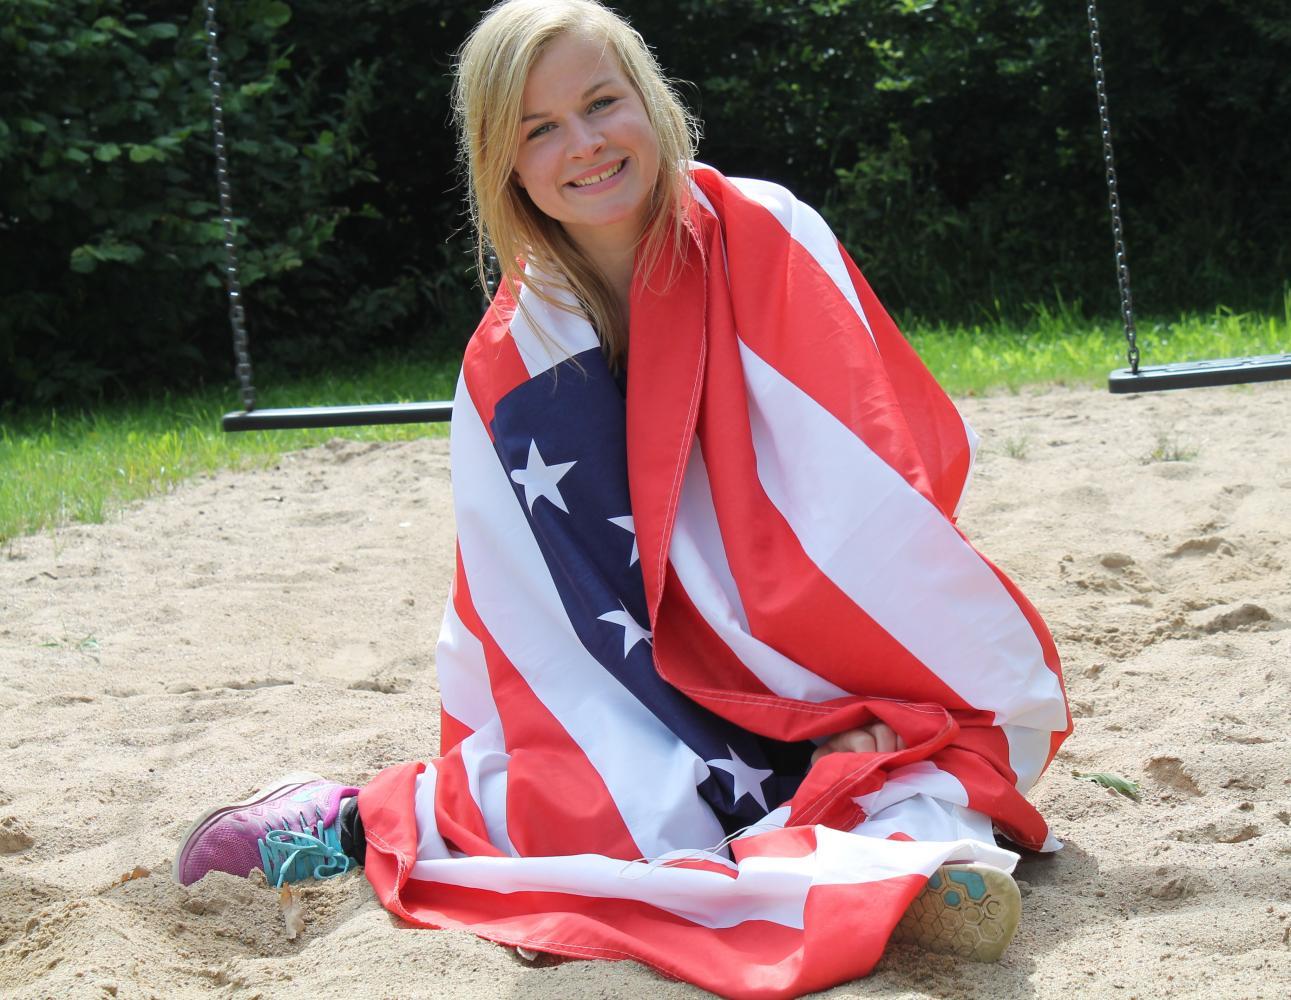 German exchange student Louisa Boockhoff posing with an American flag.